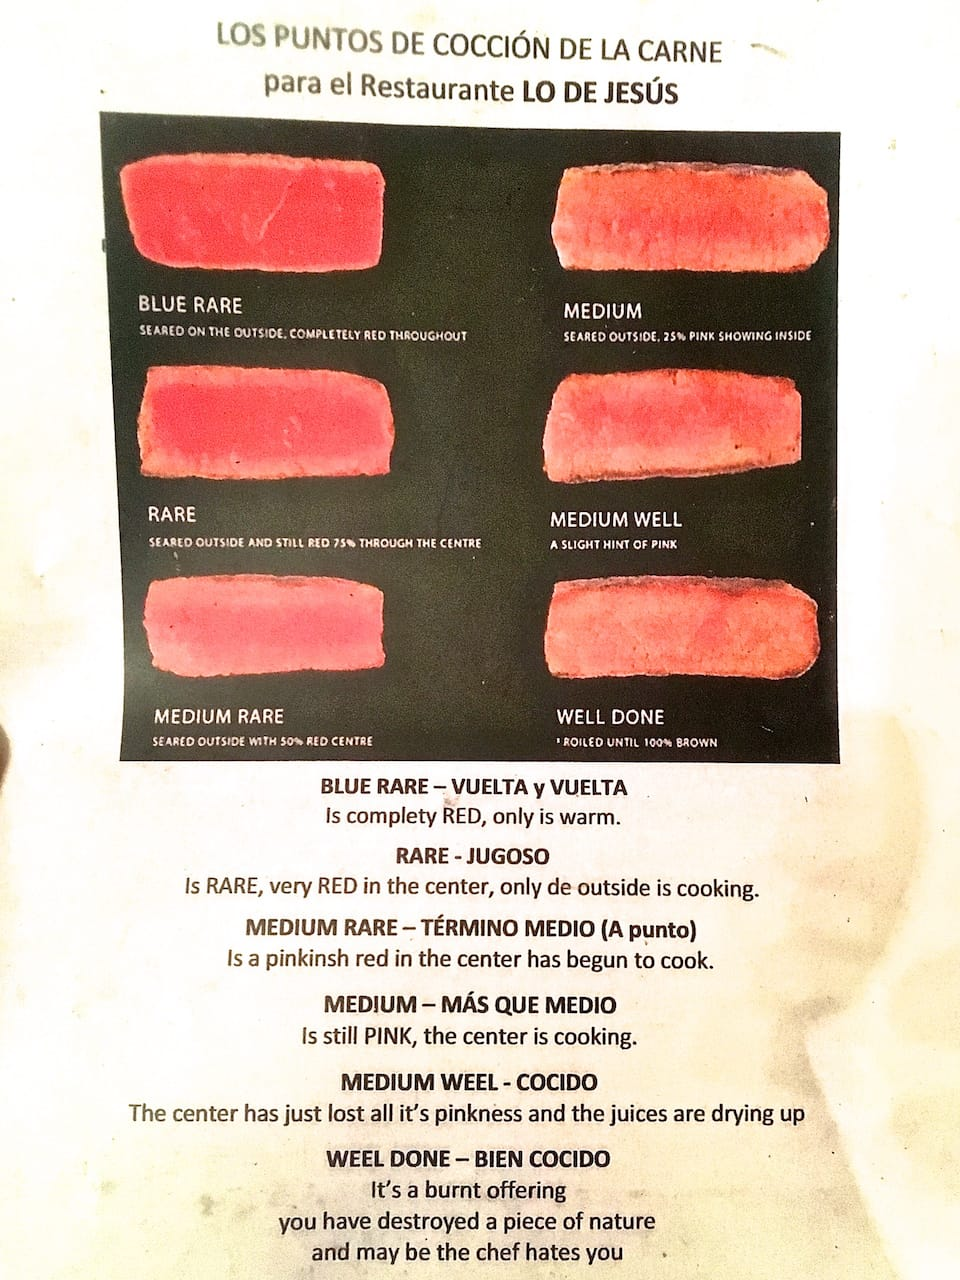 Best food of Argentina ordering steak guide